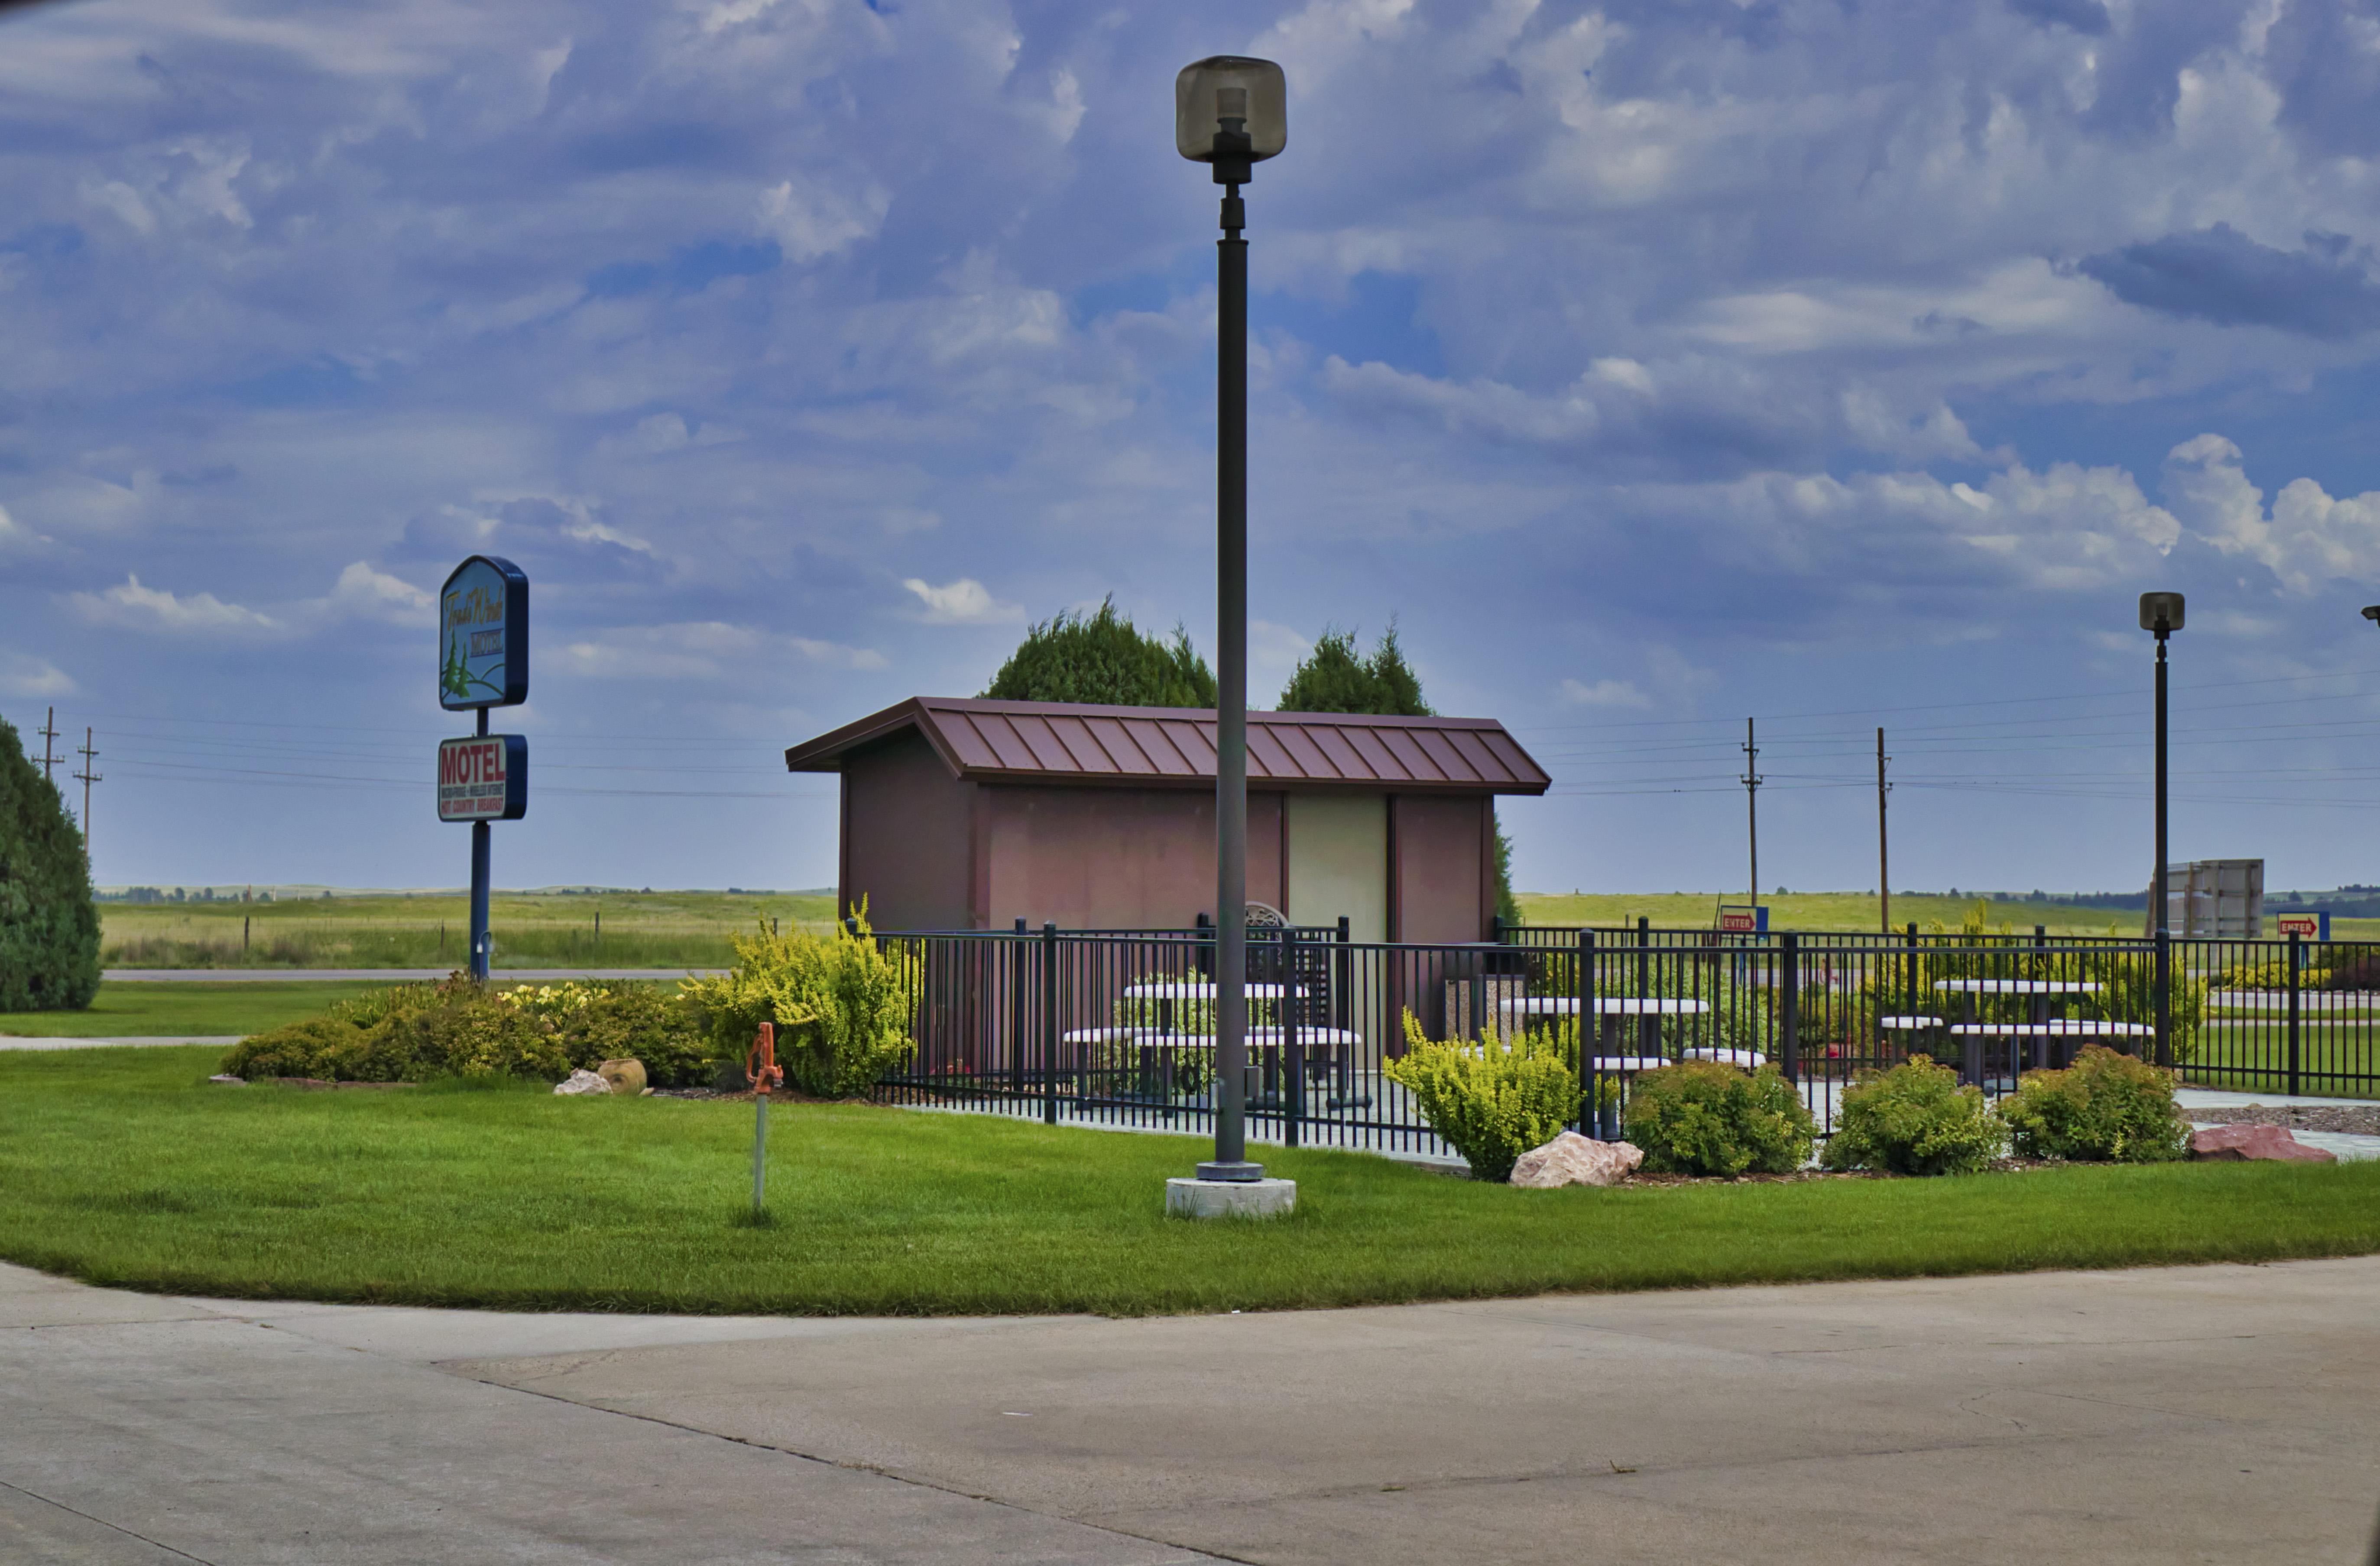 Motel Prairie Shed